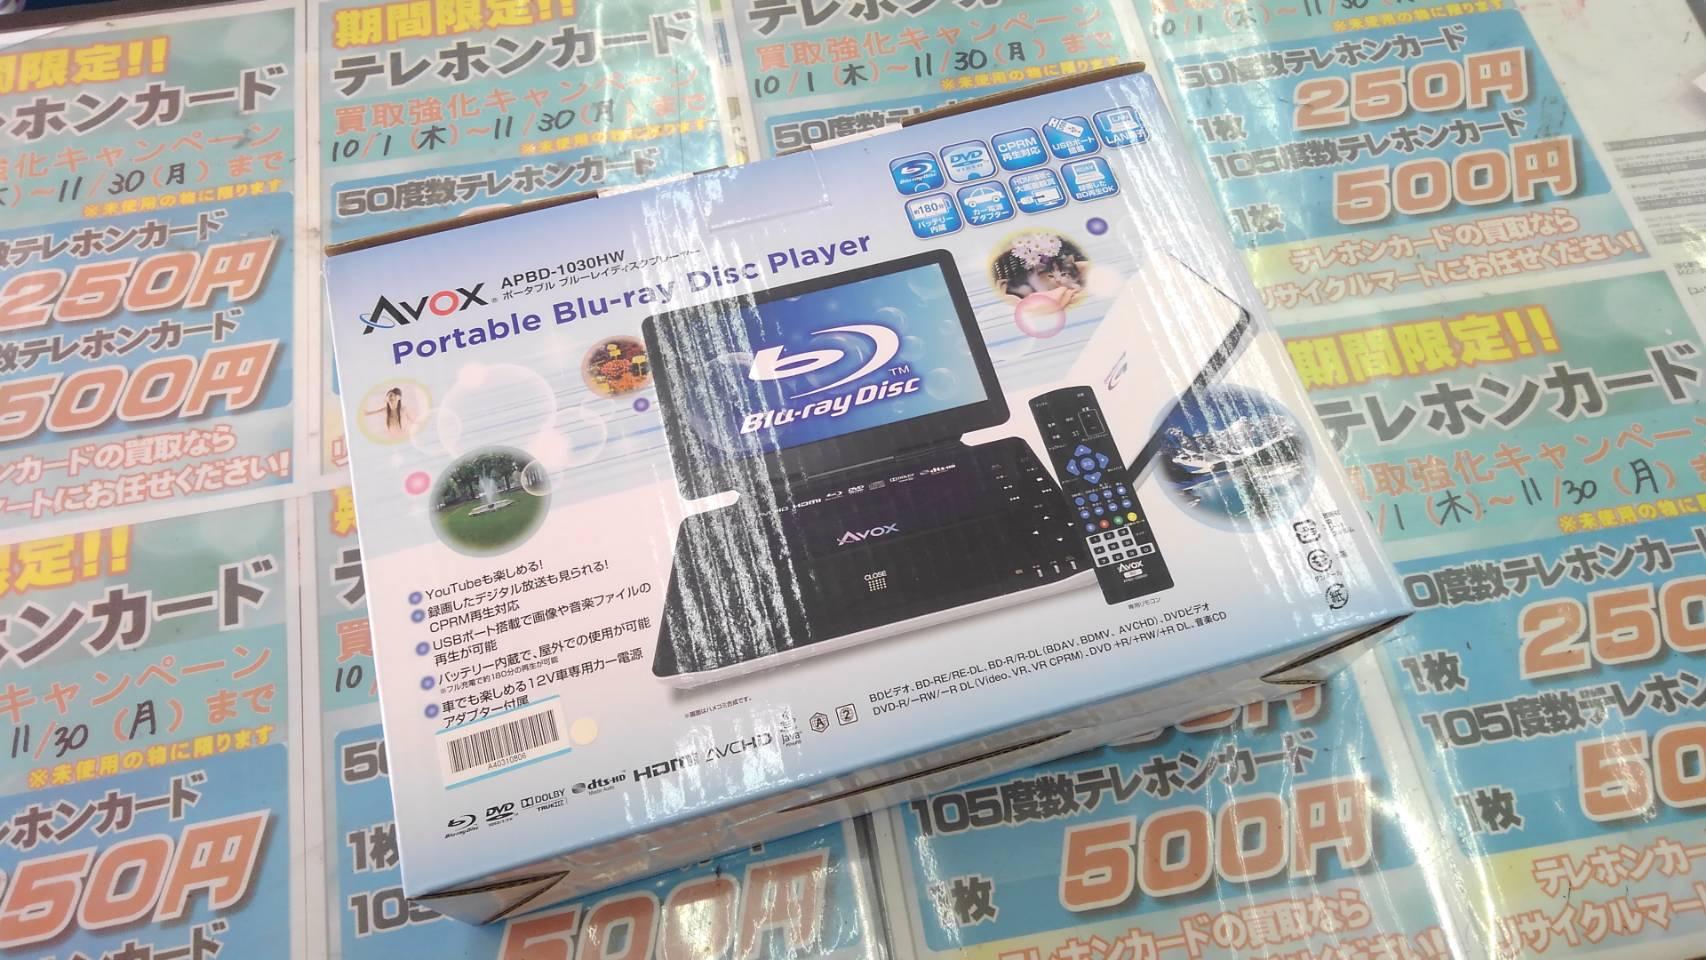 【AVOX ポータブル ブルーレイプレーヤー APBD-1030HW Blu-ray  】買い取り致しました!の買取-